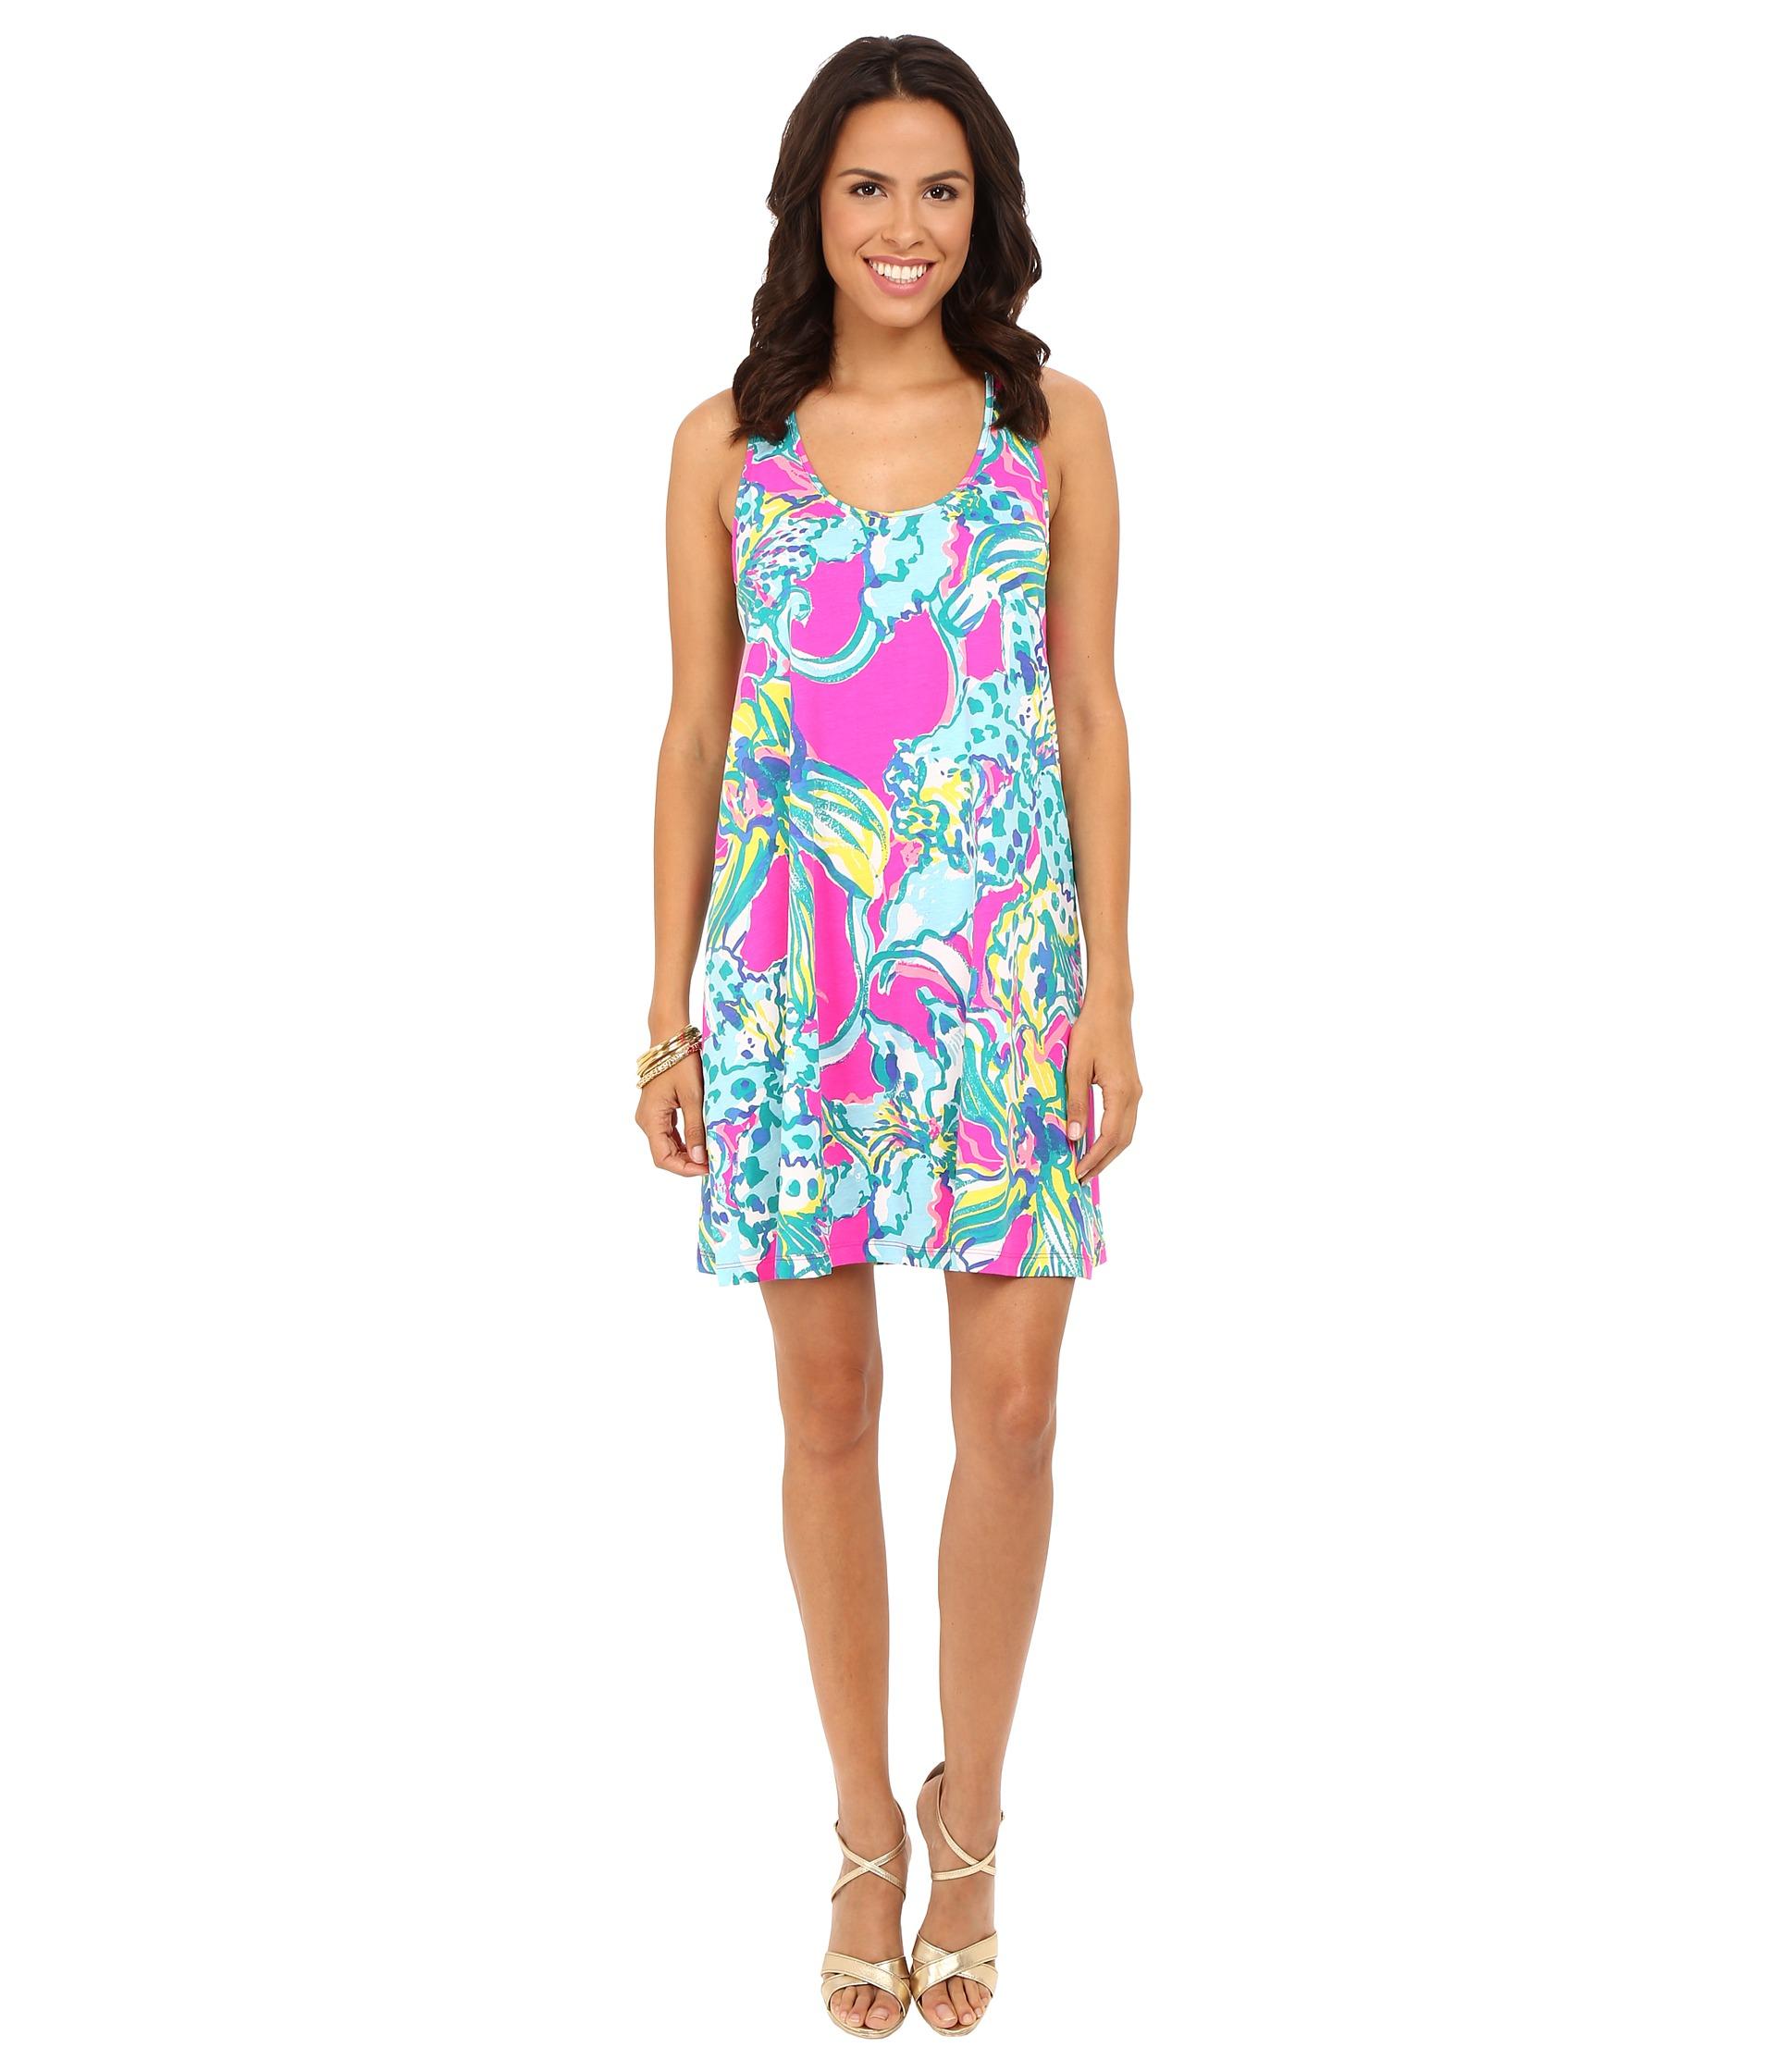 bfdb6fc957a599 Lilly Pulitzer Melle Dress - Lyst